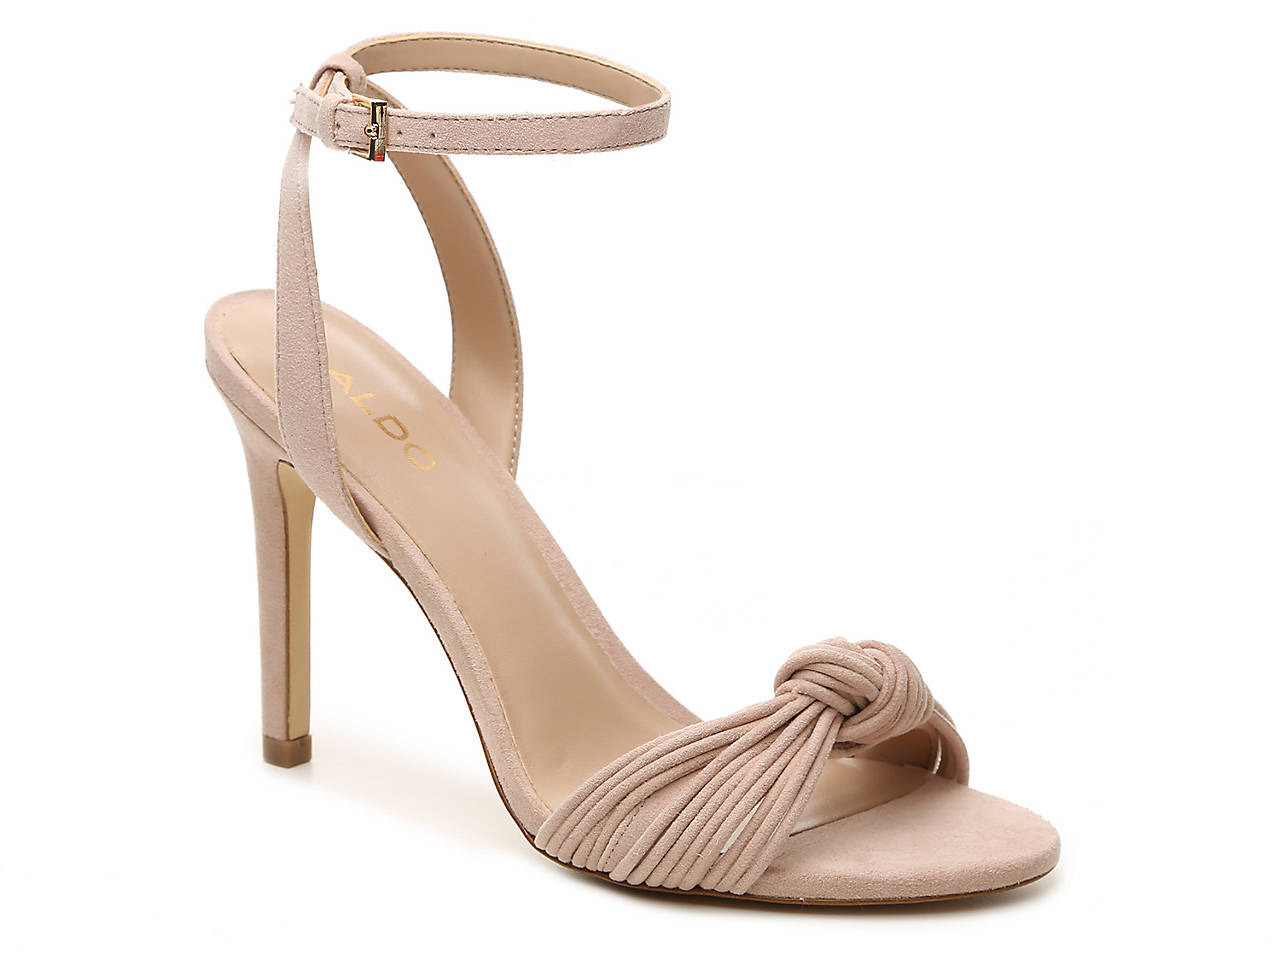 Black wedge sandals 2 inch heel - Toilla Sandal